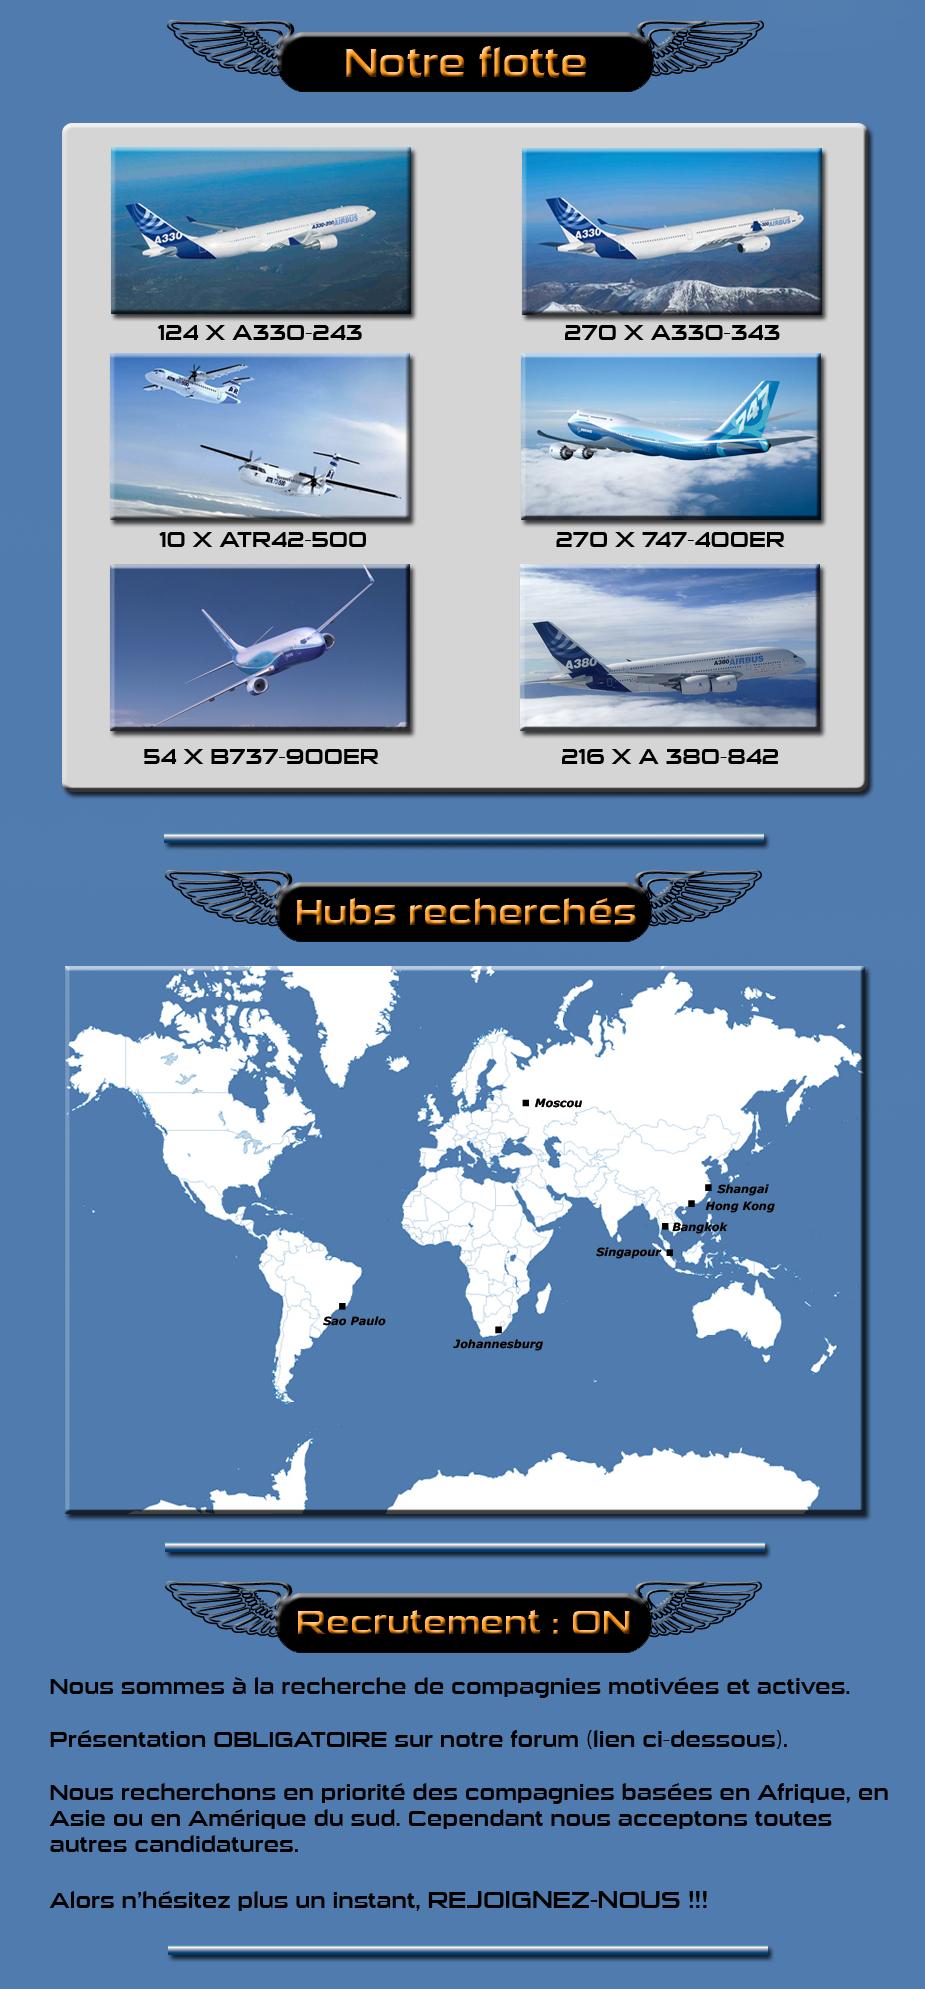 Trans\' International Group - Présentation 1201311153341281289371774